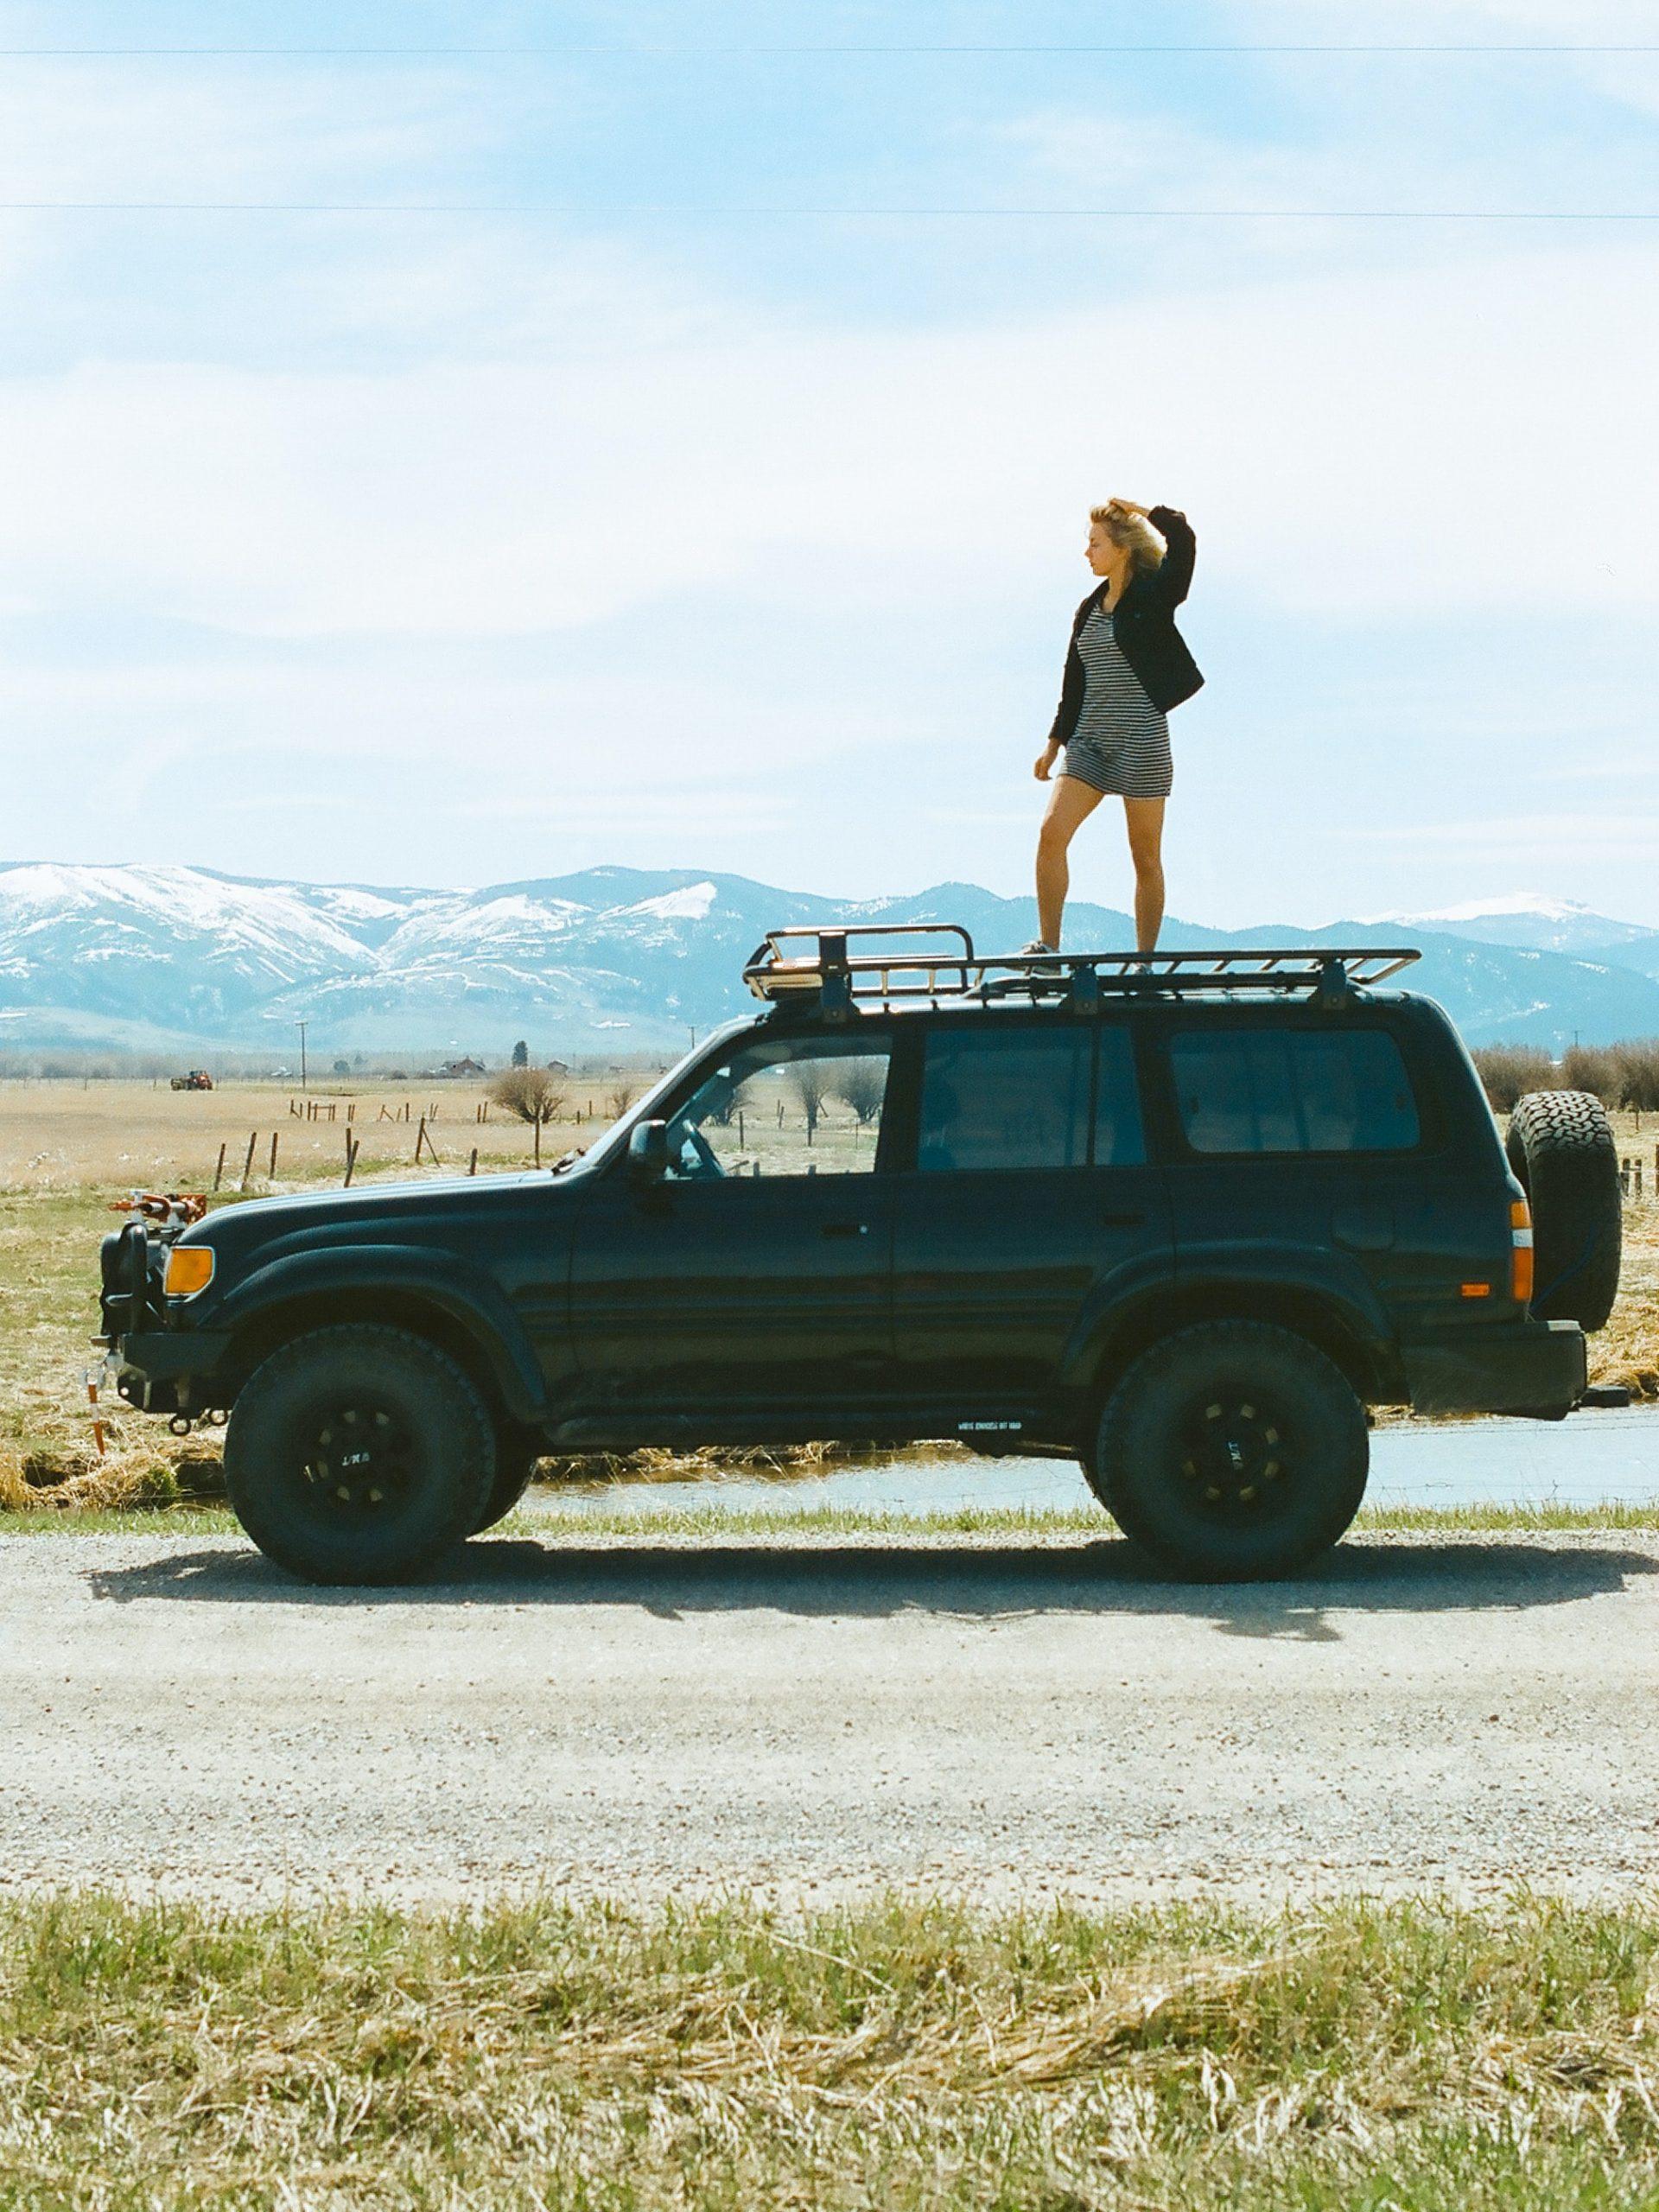 79 Series Landcruiser Upgrades - woman standing on car